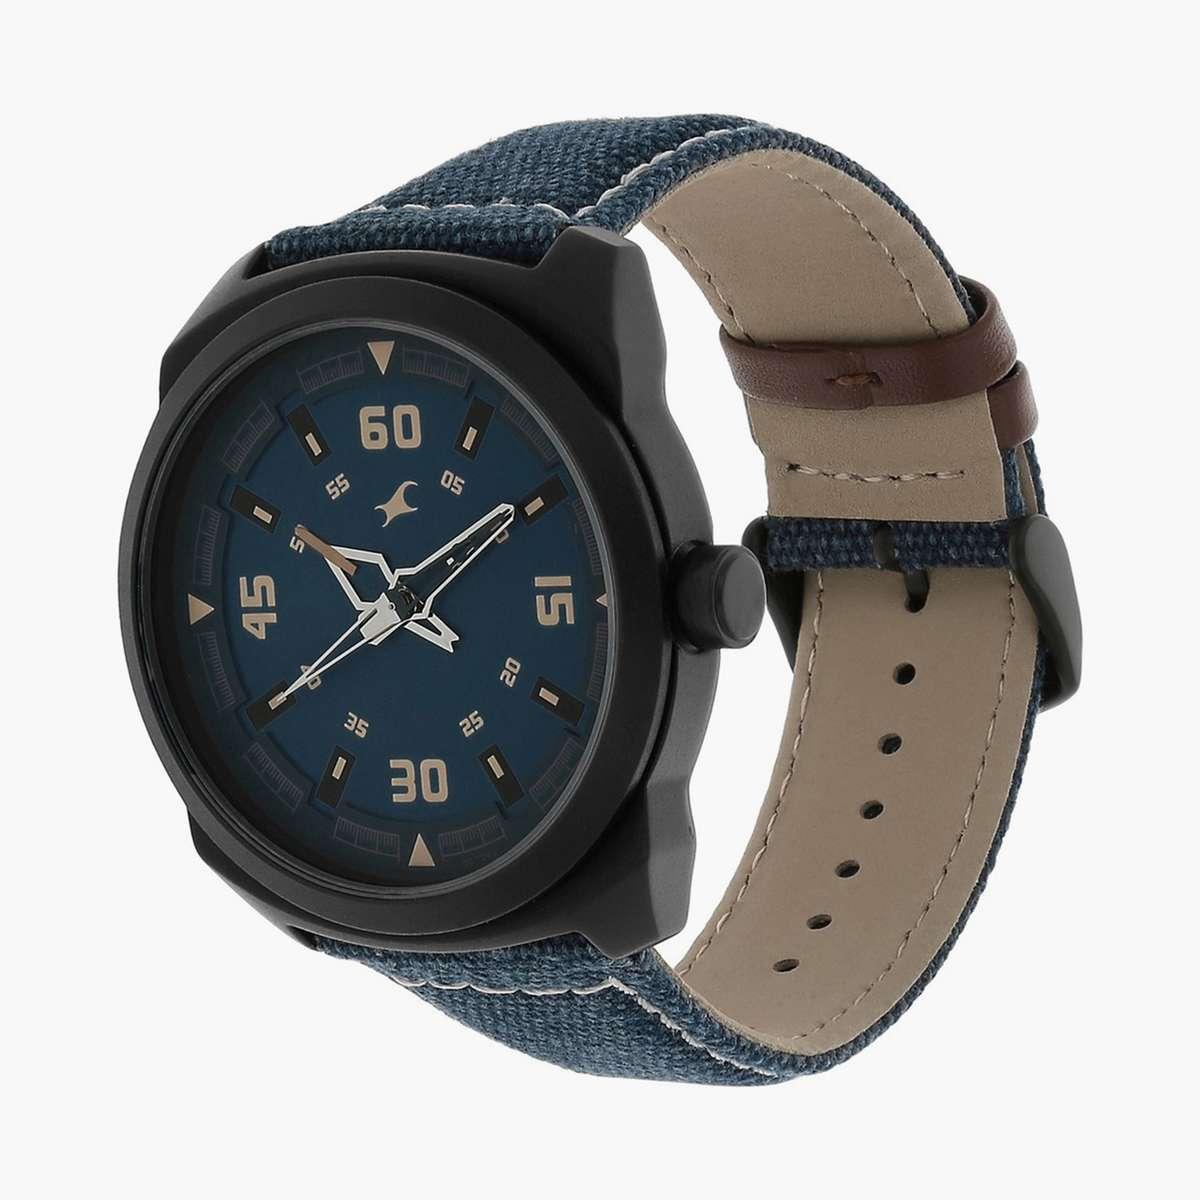 FASTRACK Round Dial Analog Men's Wristwatch - NM9463AL07